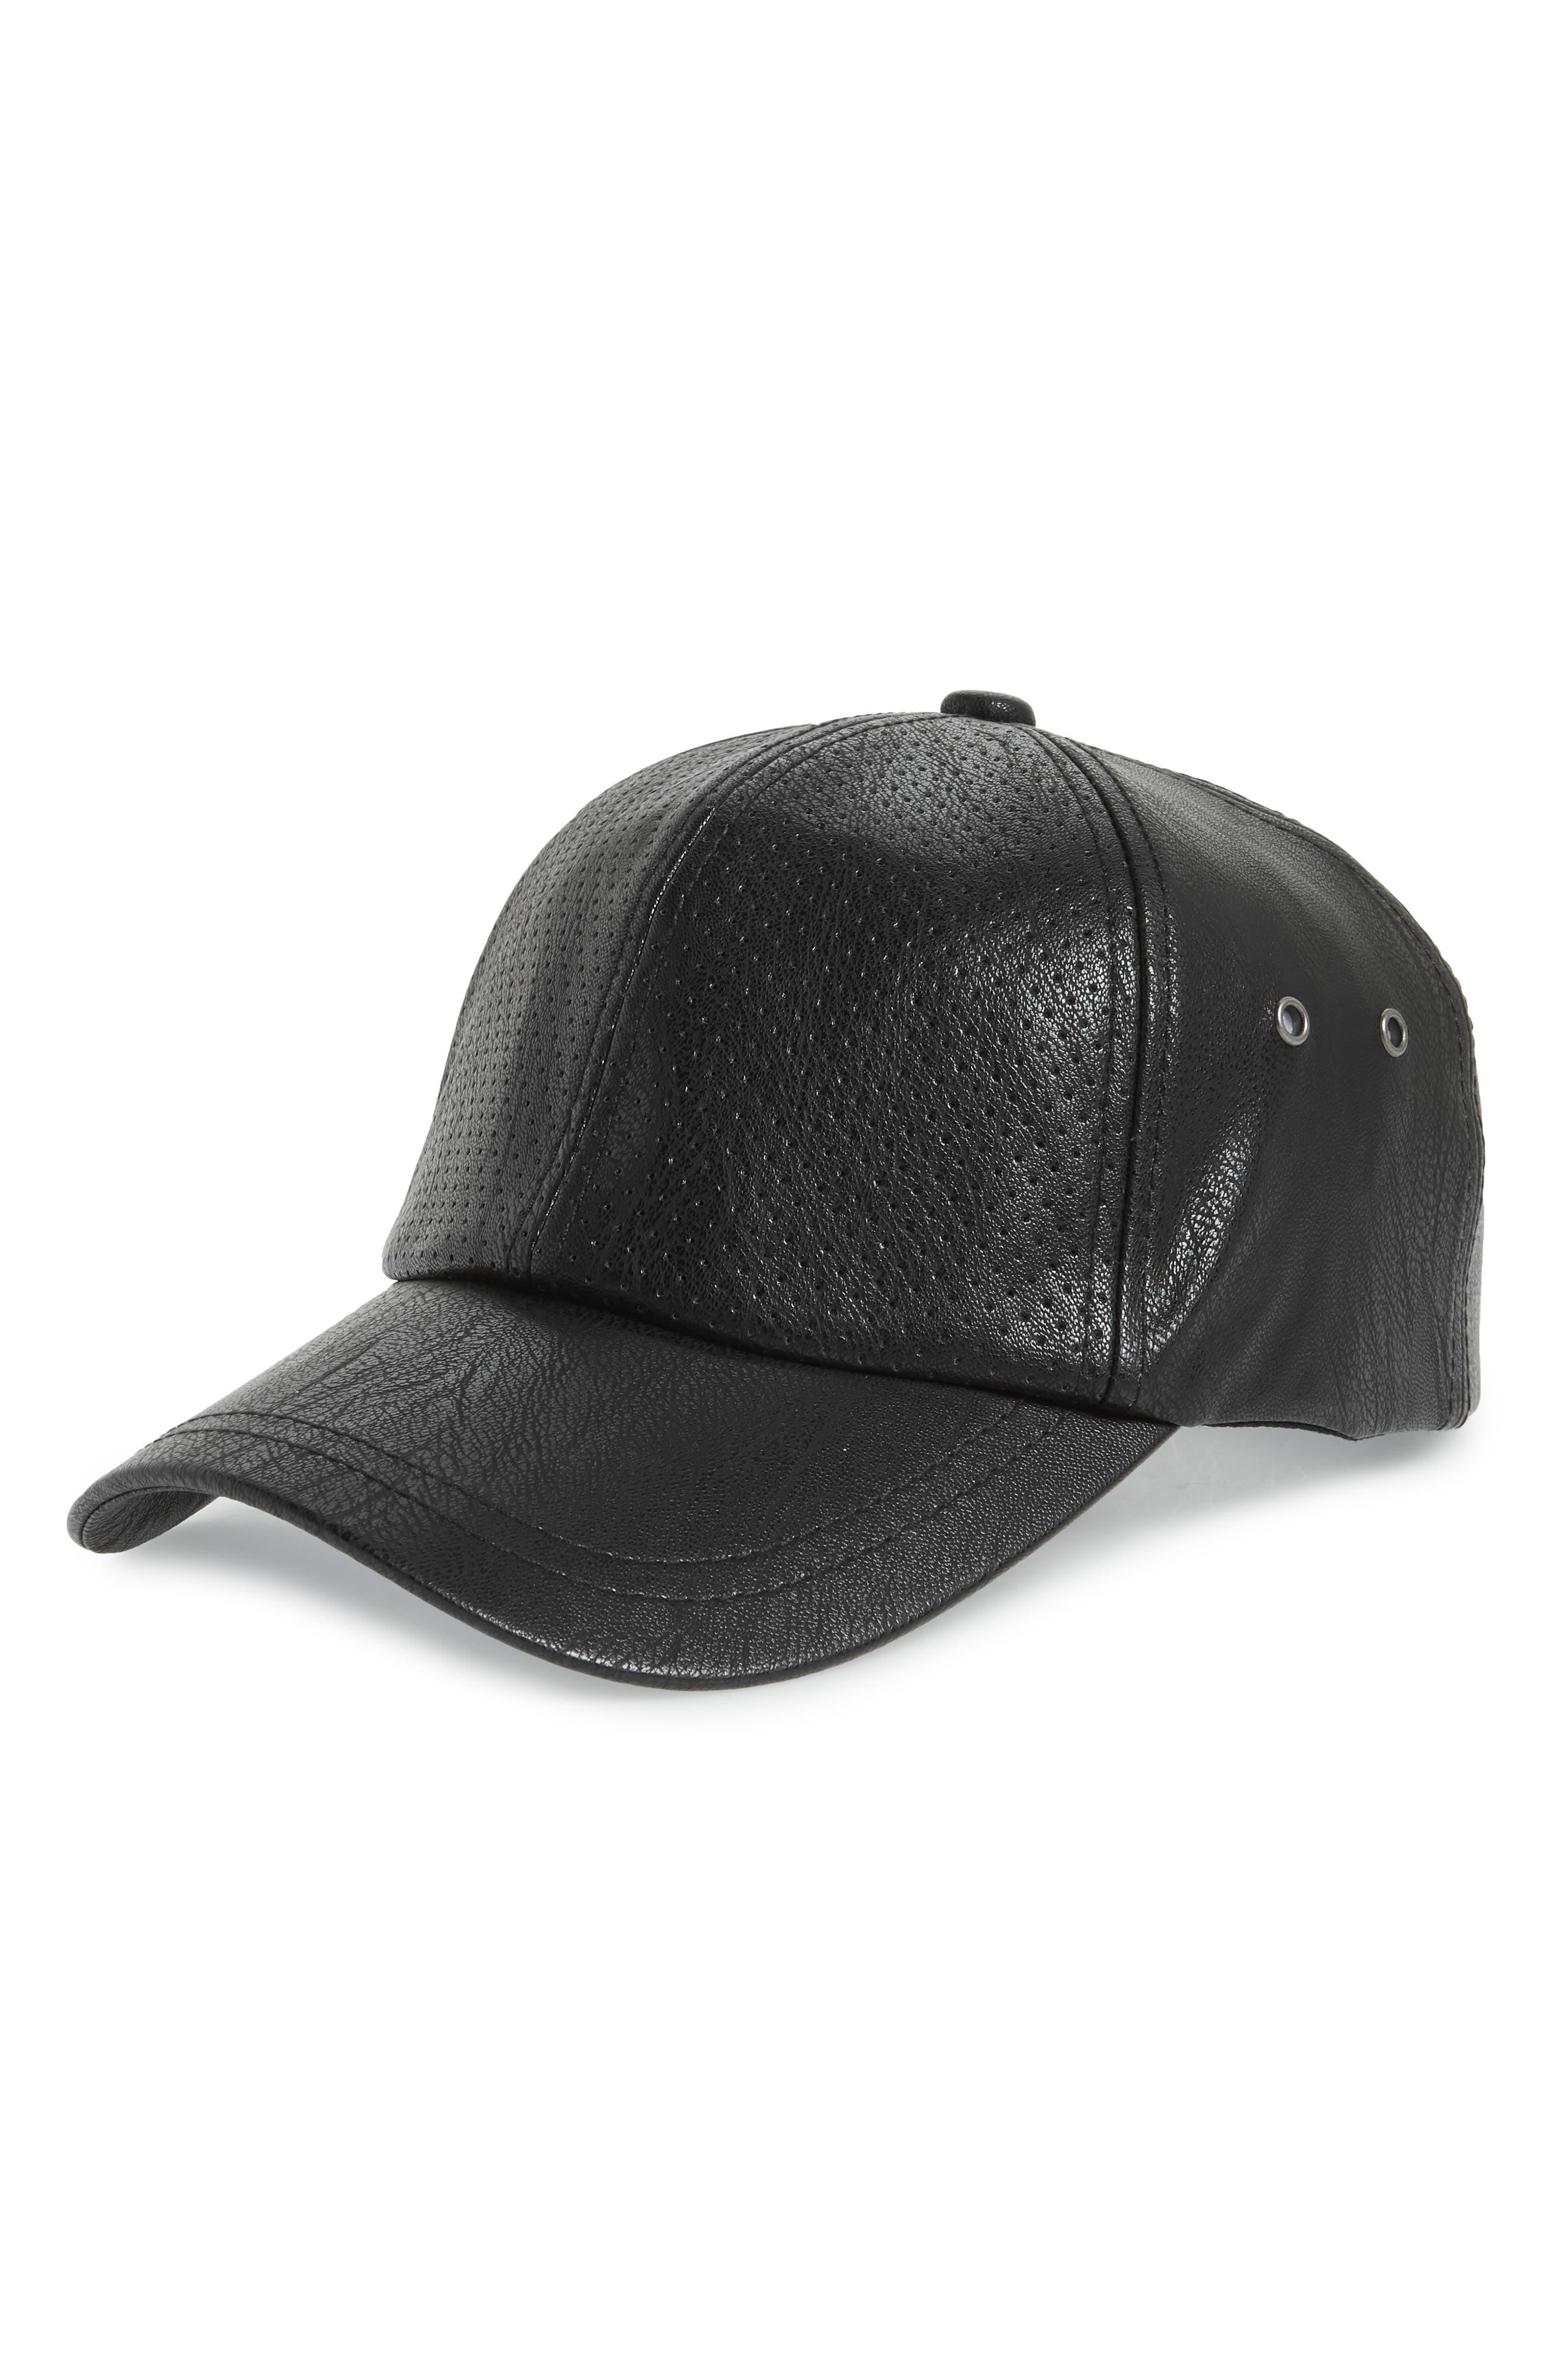 Faux Leather Baseball Cap,                             Main thumbnail 1, color,                             Black